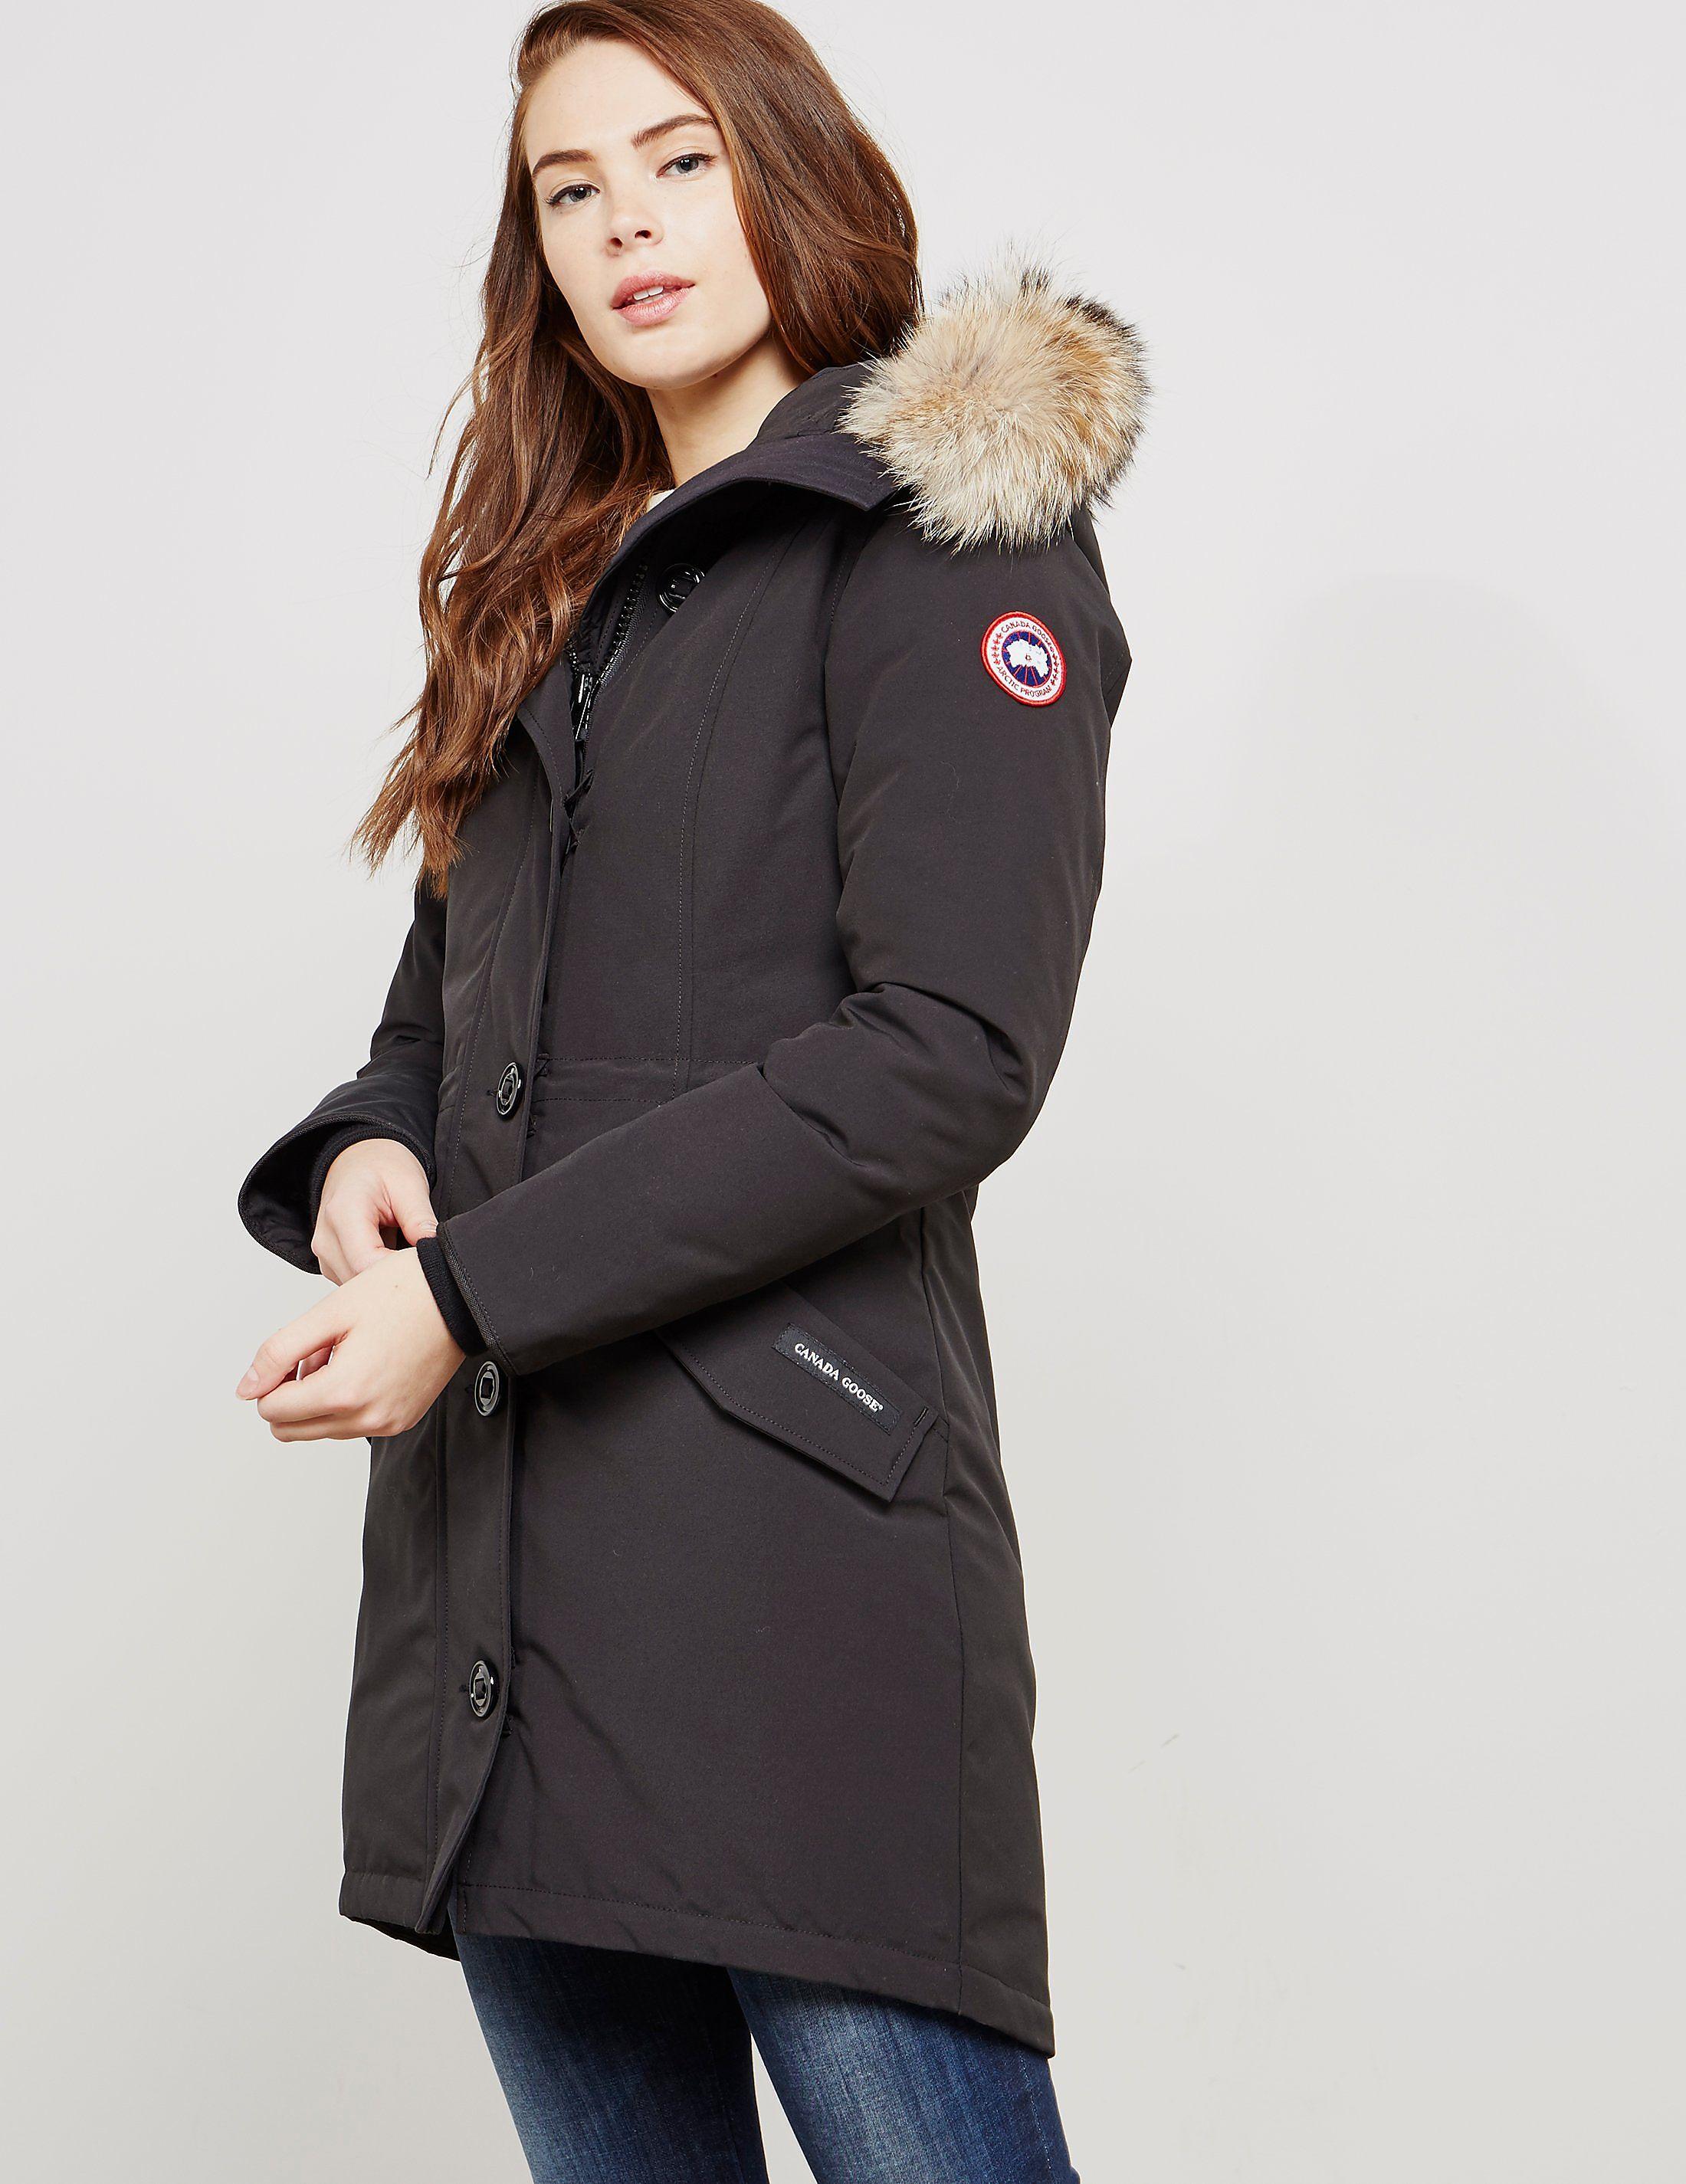 canada goose jacket women